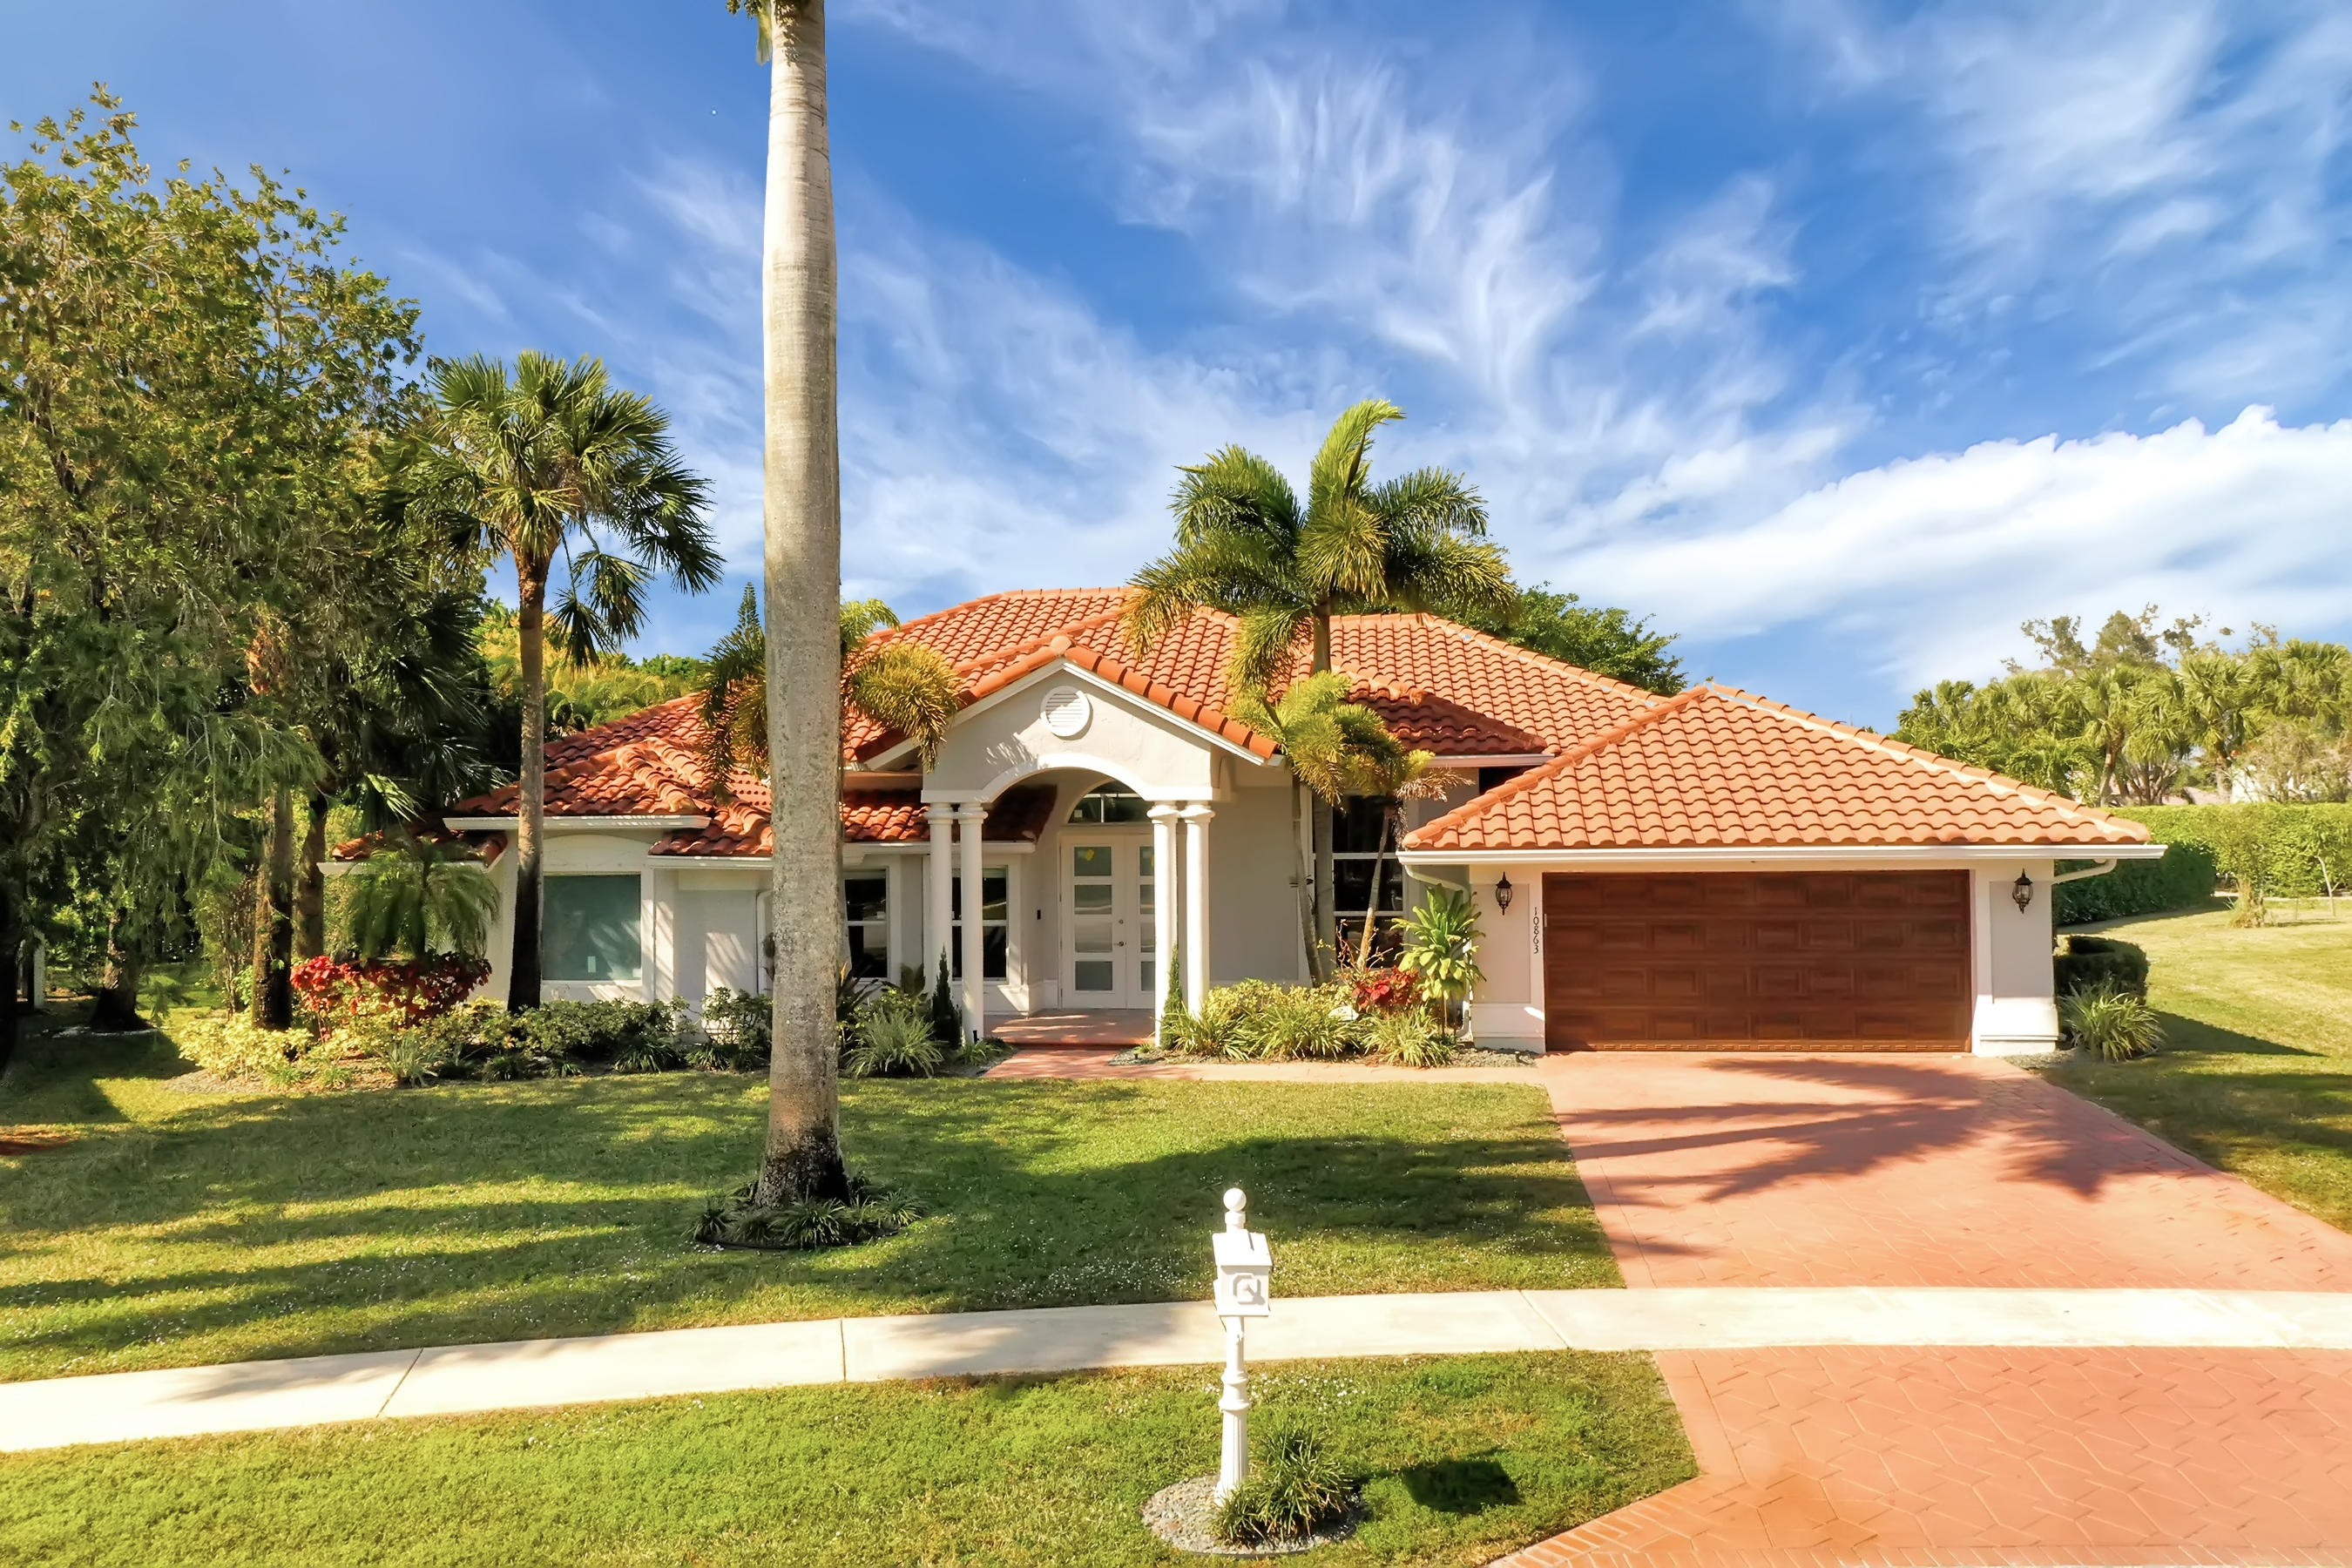 Photo of 10863 Japonica Court, Boca Raton, FL 33498